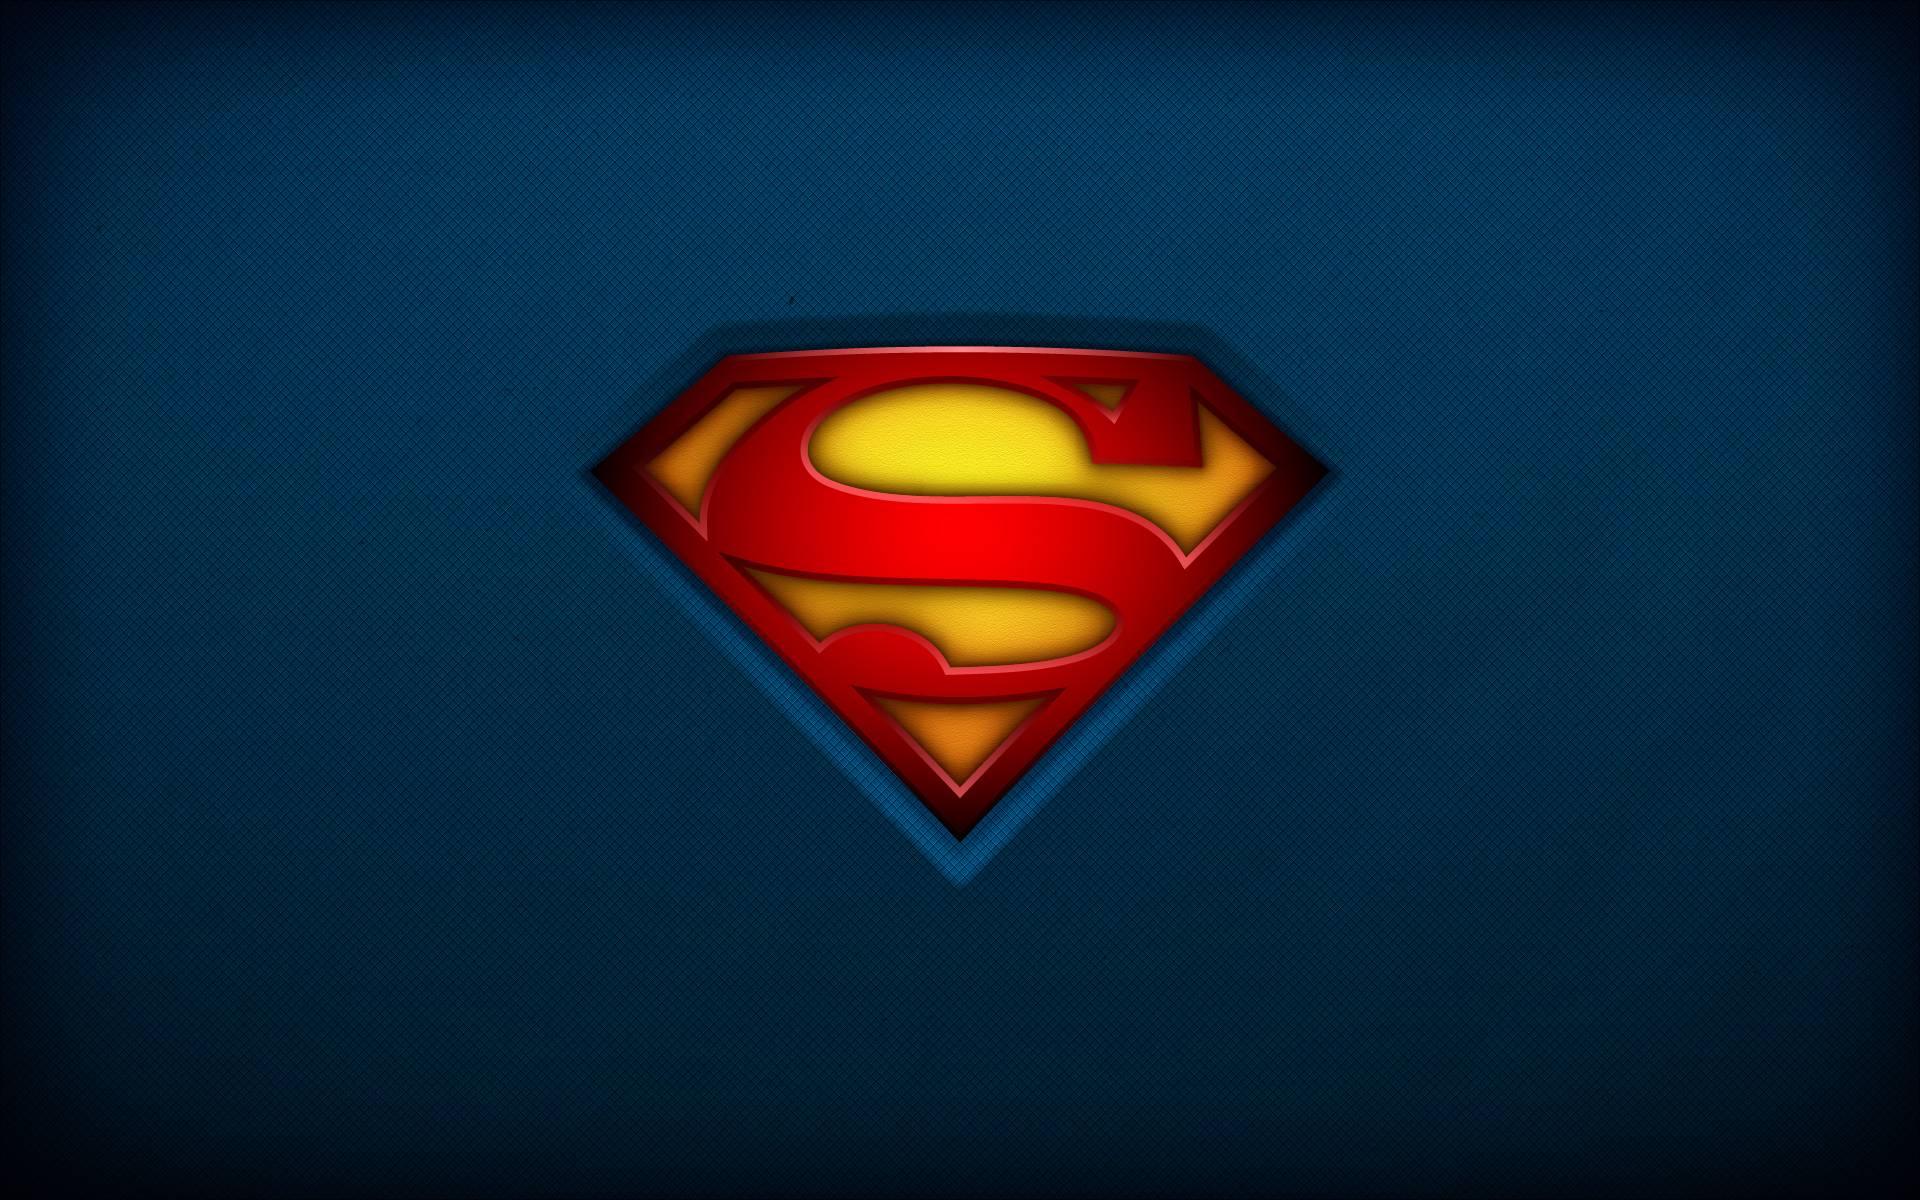 Superman Laptop Wallpapers Top Free Superman Laptop Backgrounds